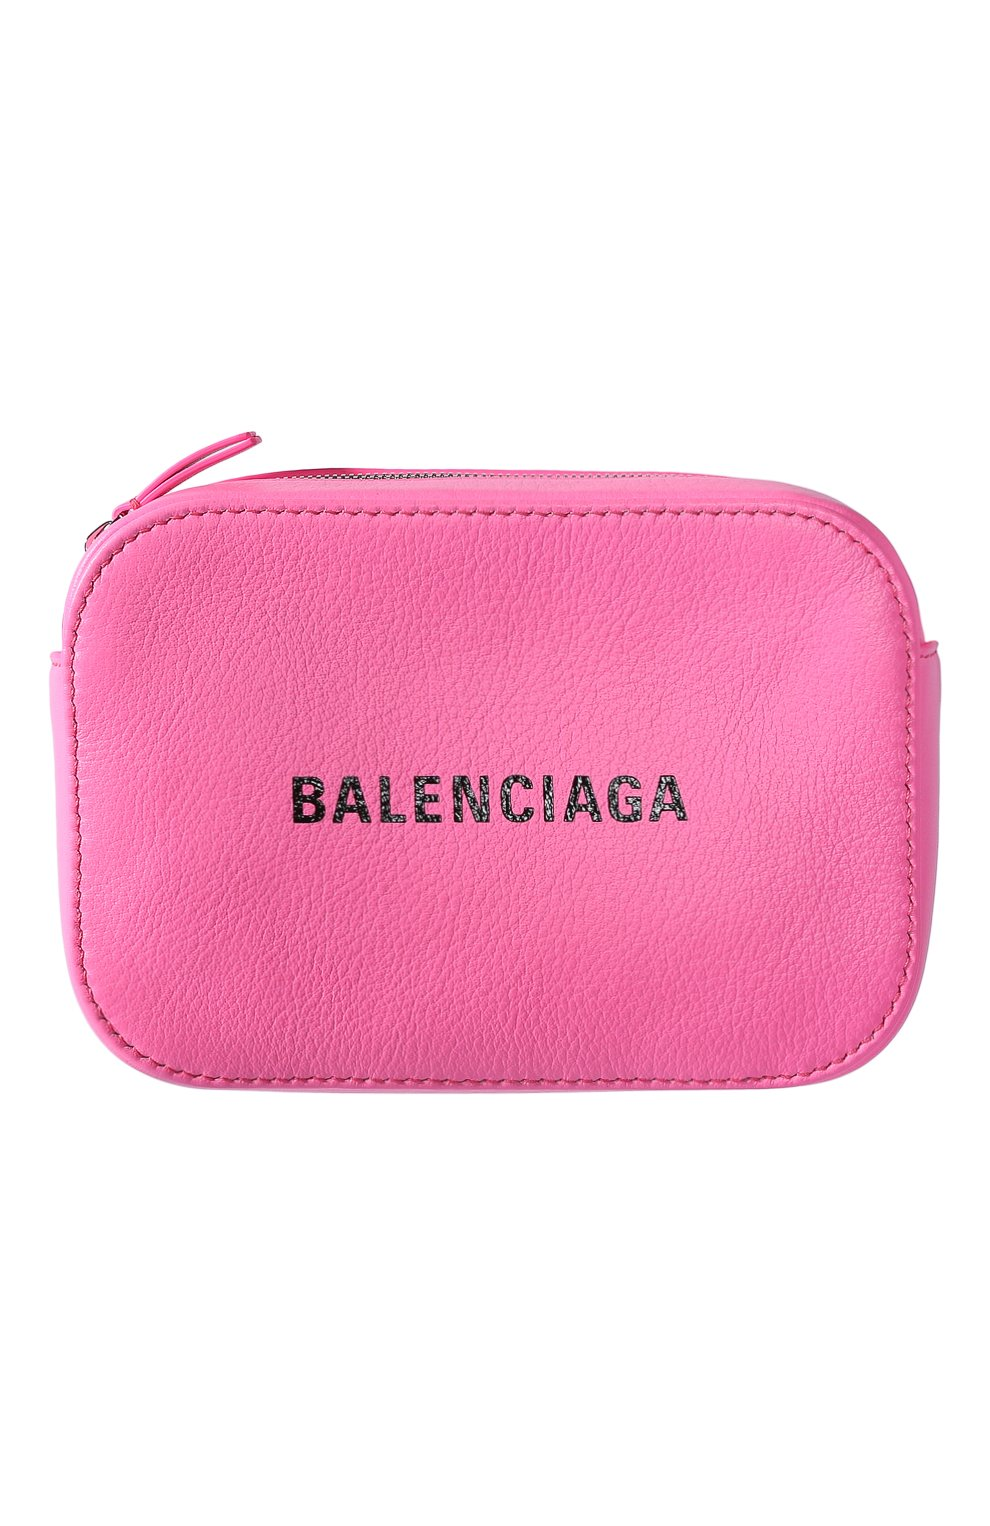 Сумка Everyday Camera XS Balenciaga розовая цвета   Фото №1